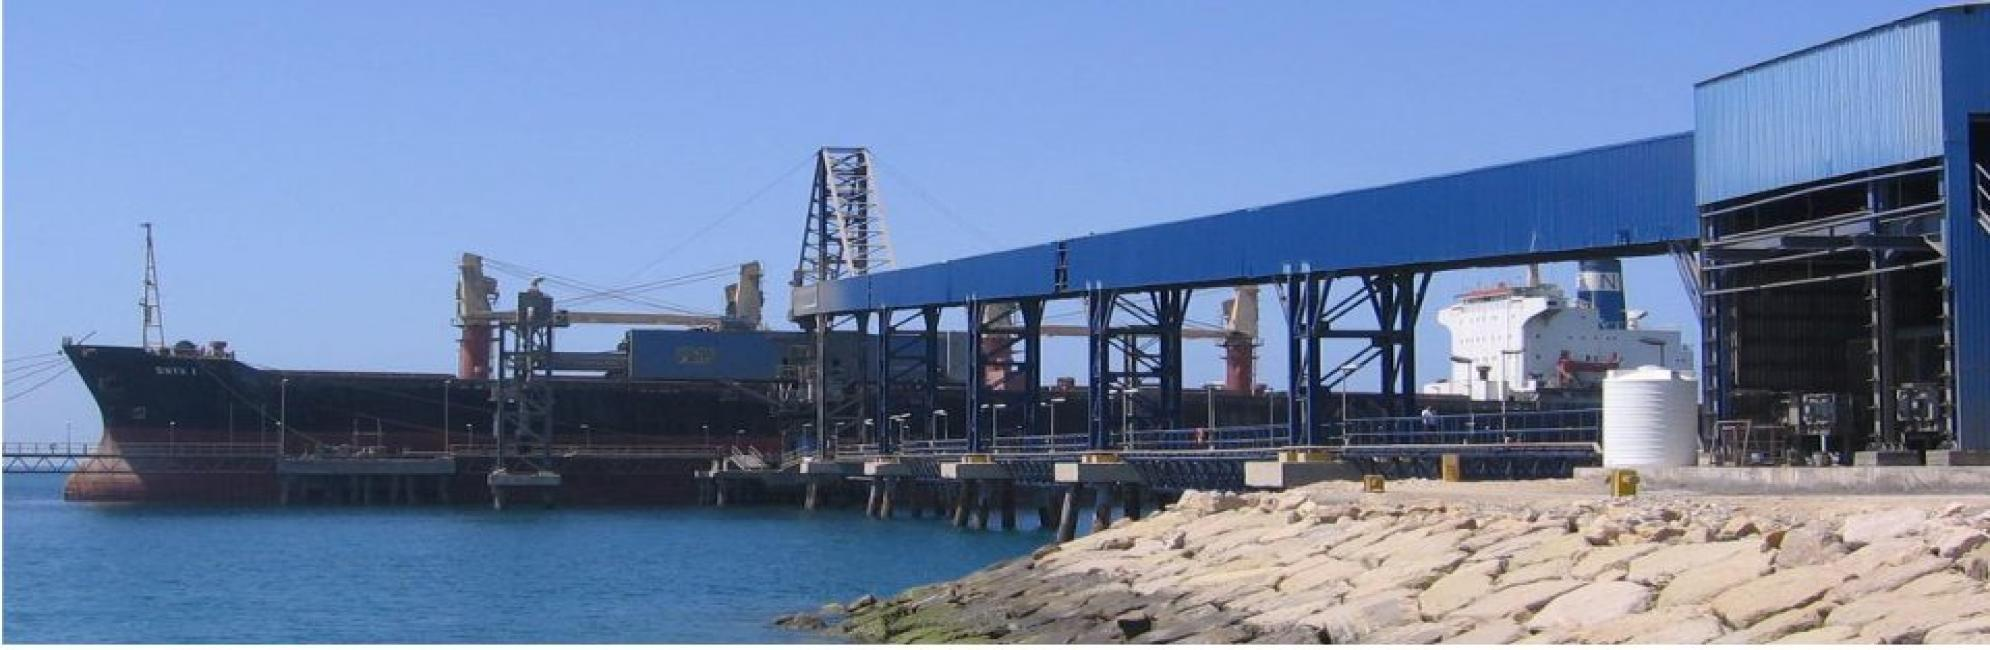 Sarooj  50,000 GT Berth, Shiploader 1200 Ton/hr Conveyor,  Kangan, Busher Province